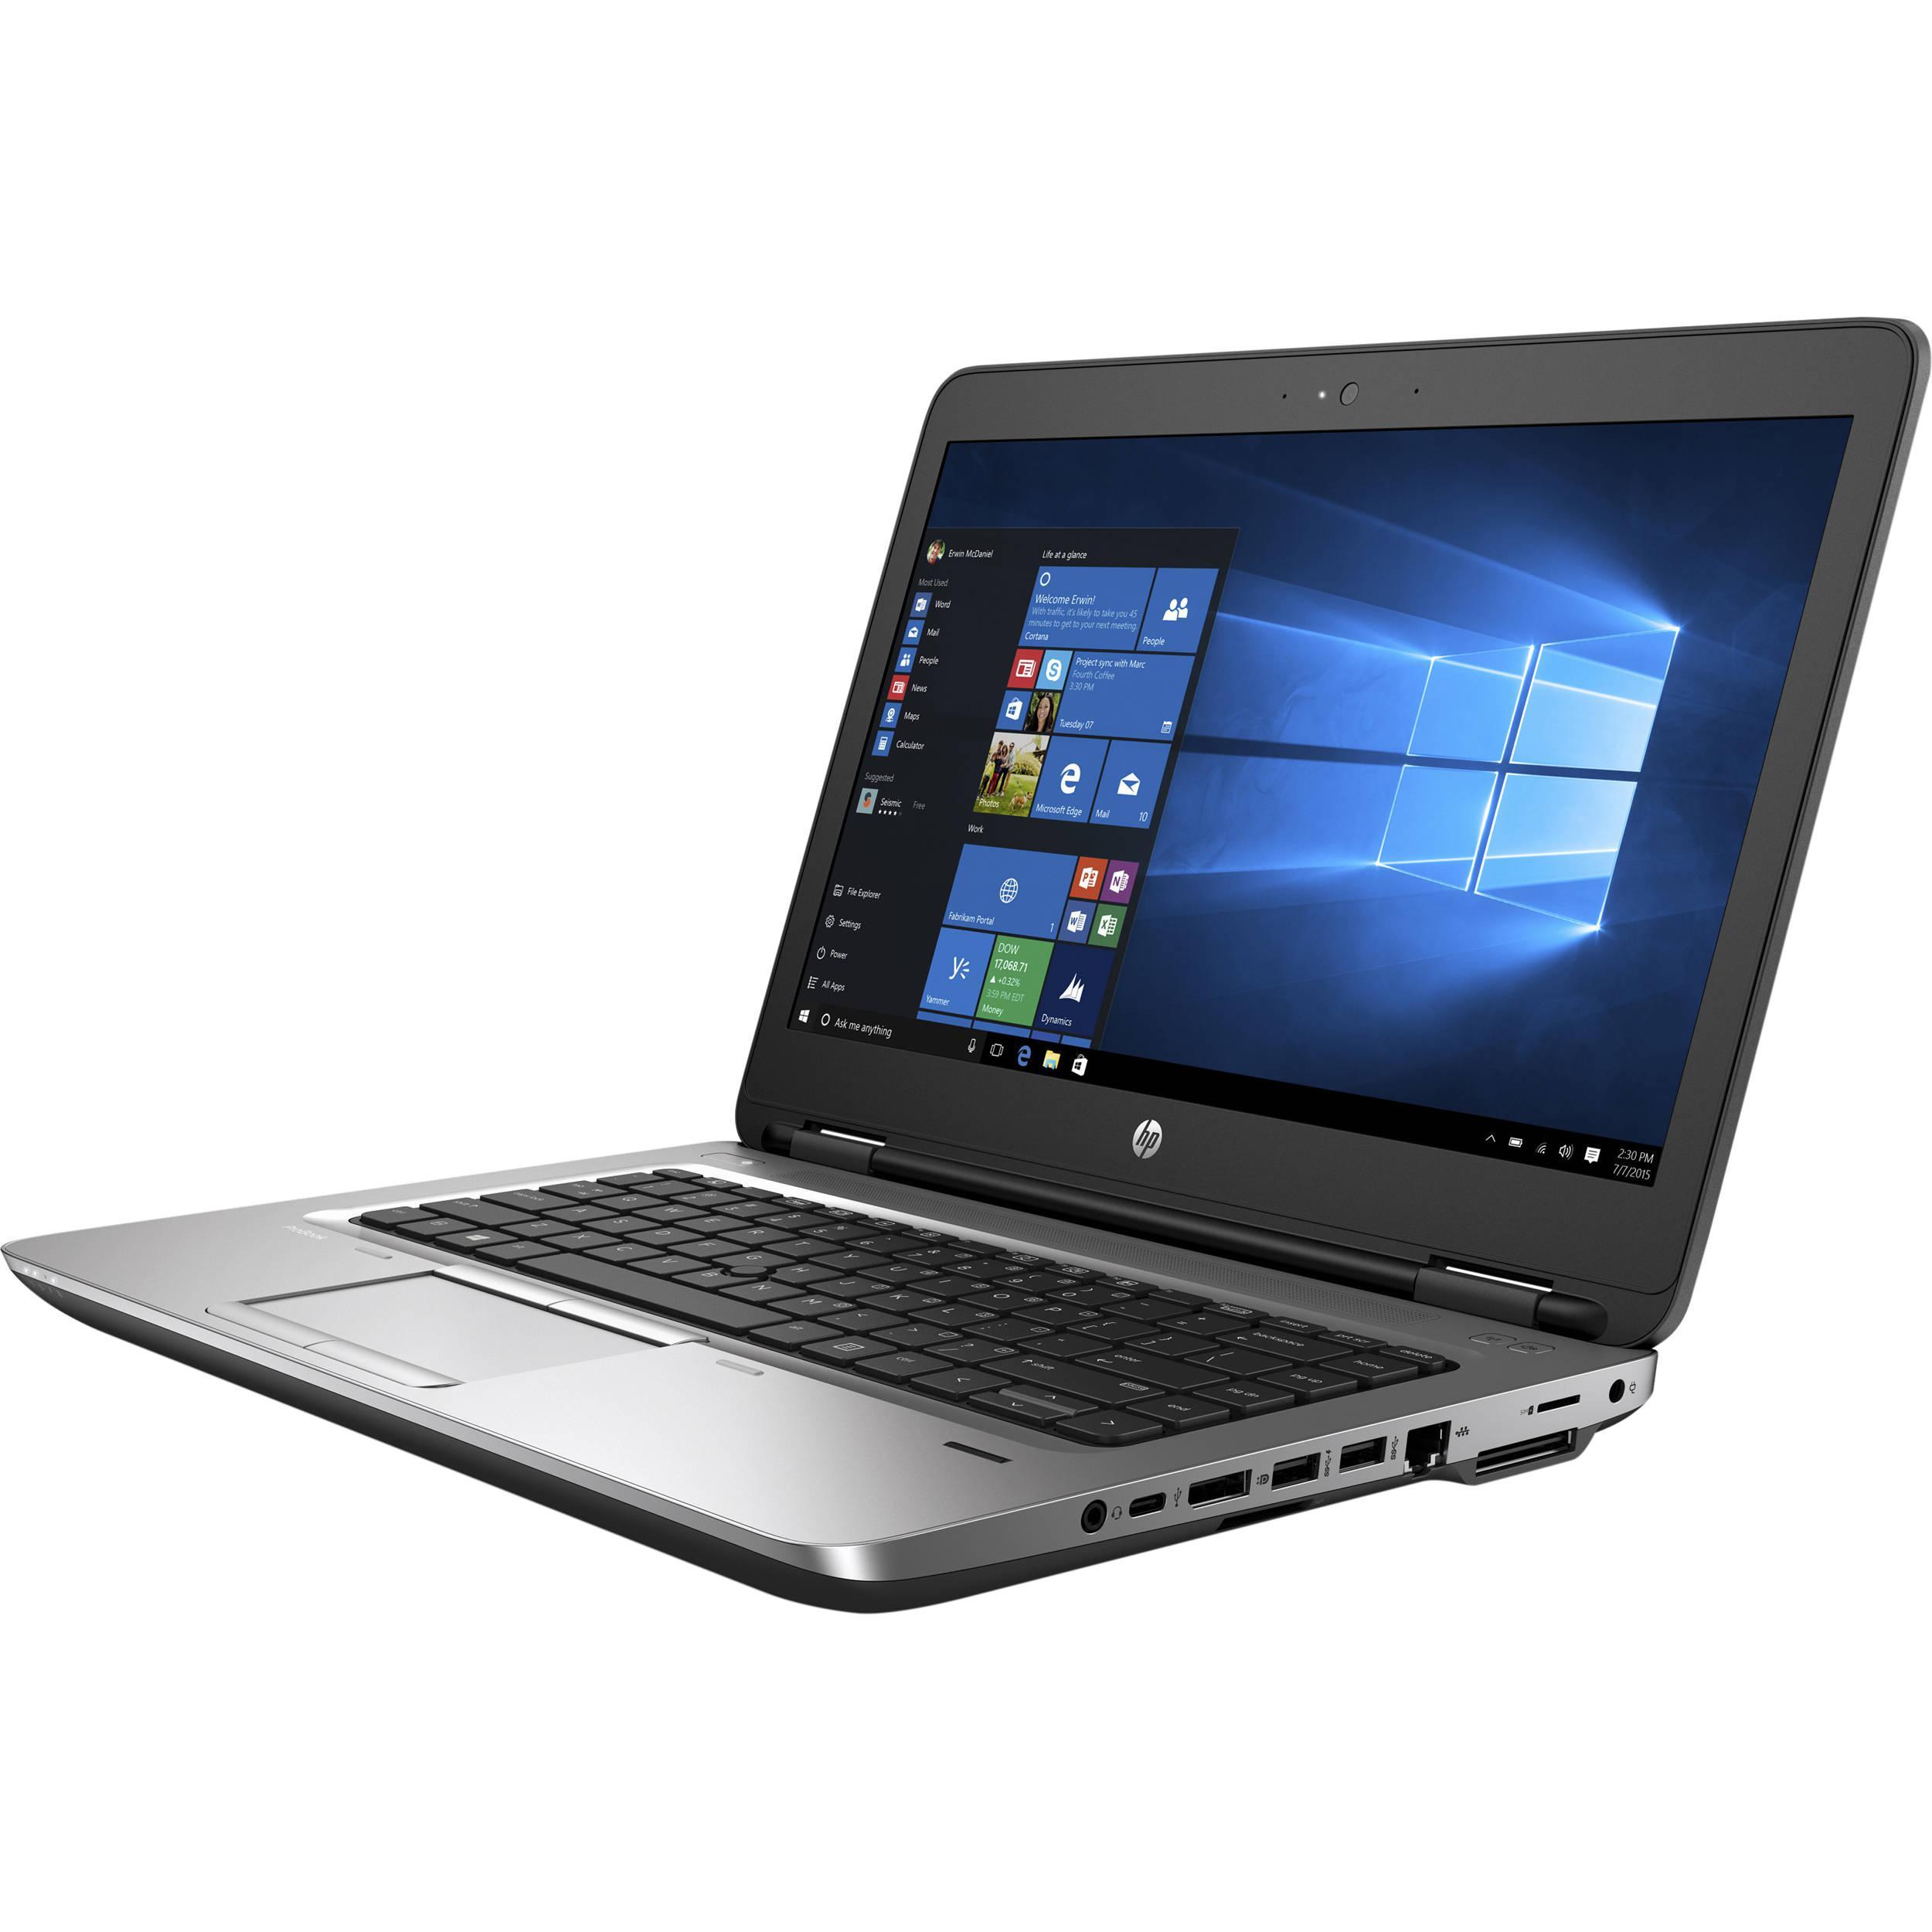 Hp ProBook 640 G2 14-inch (2016) - Core i5-6200U - 16 GB - SSD 256 GB